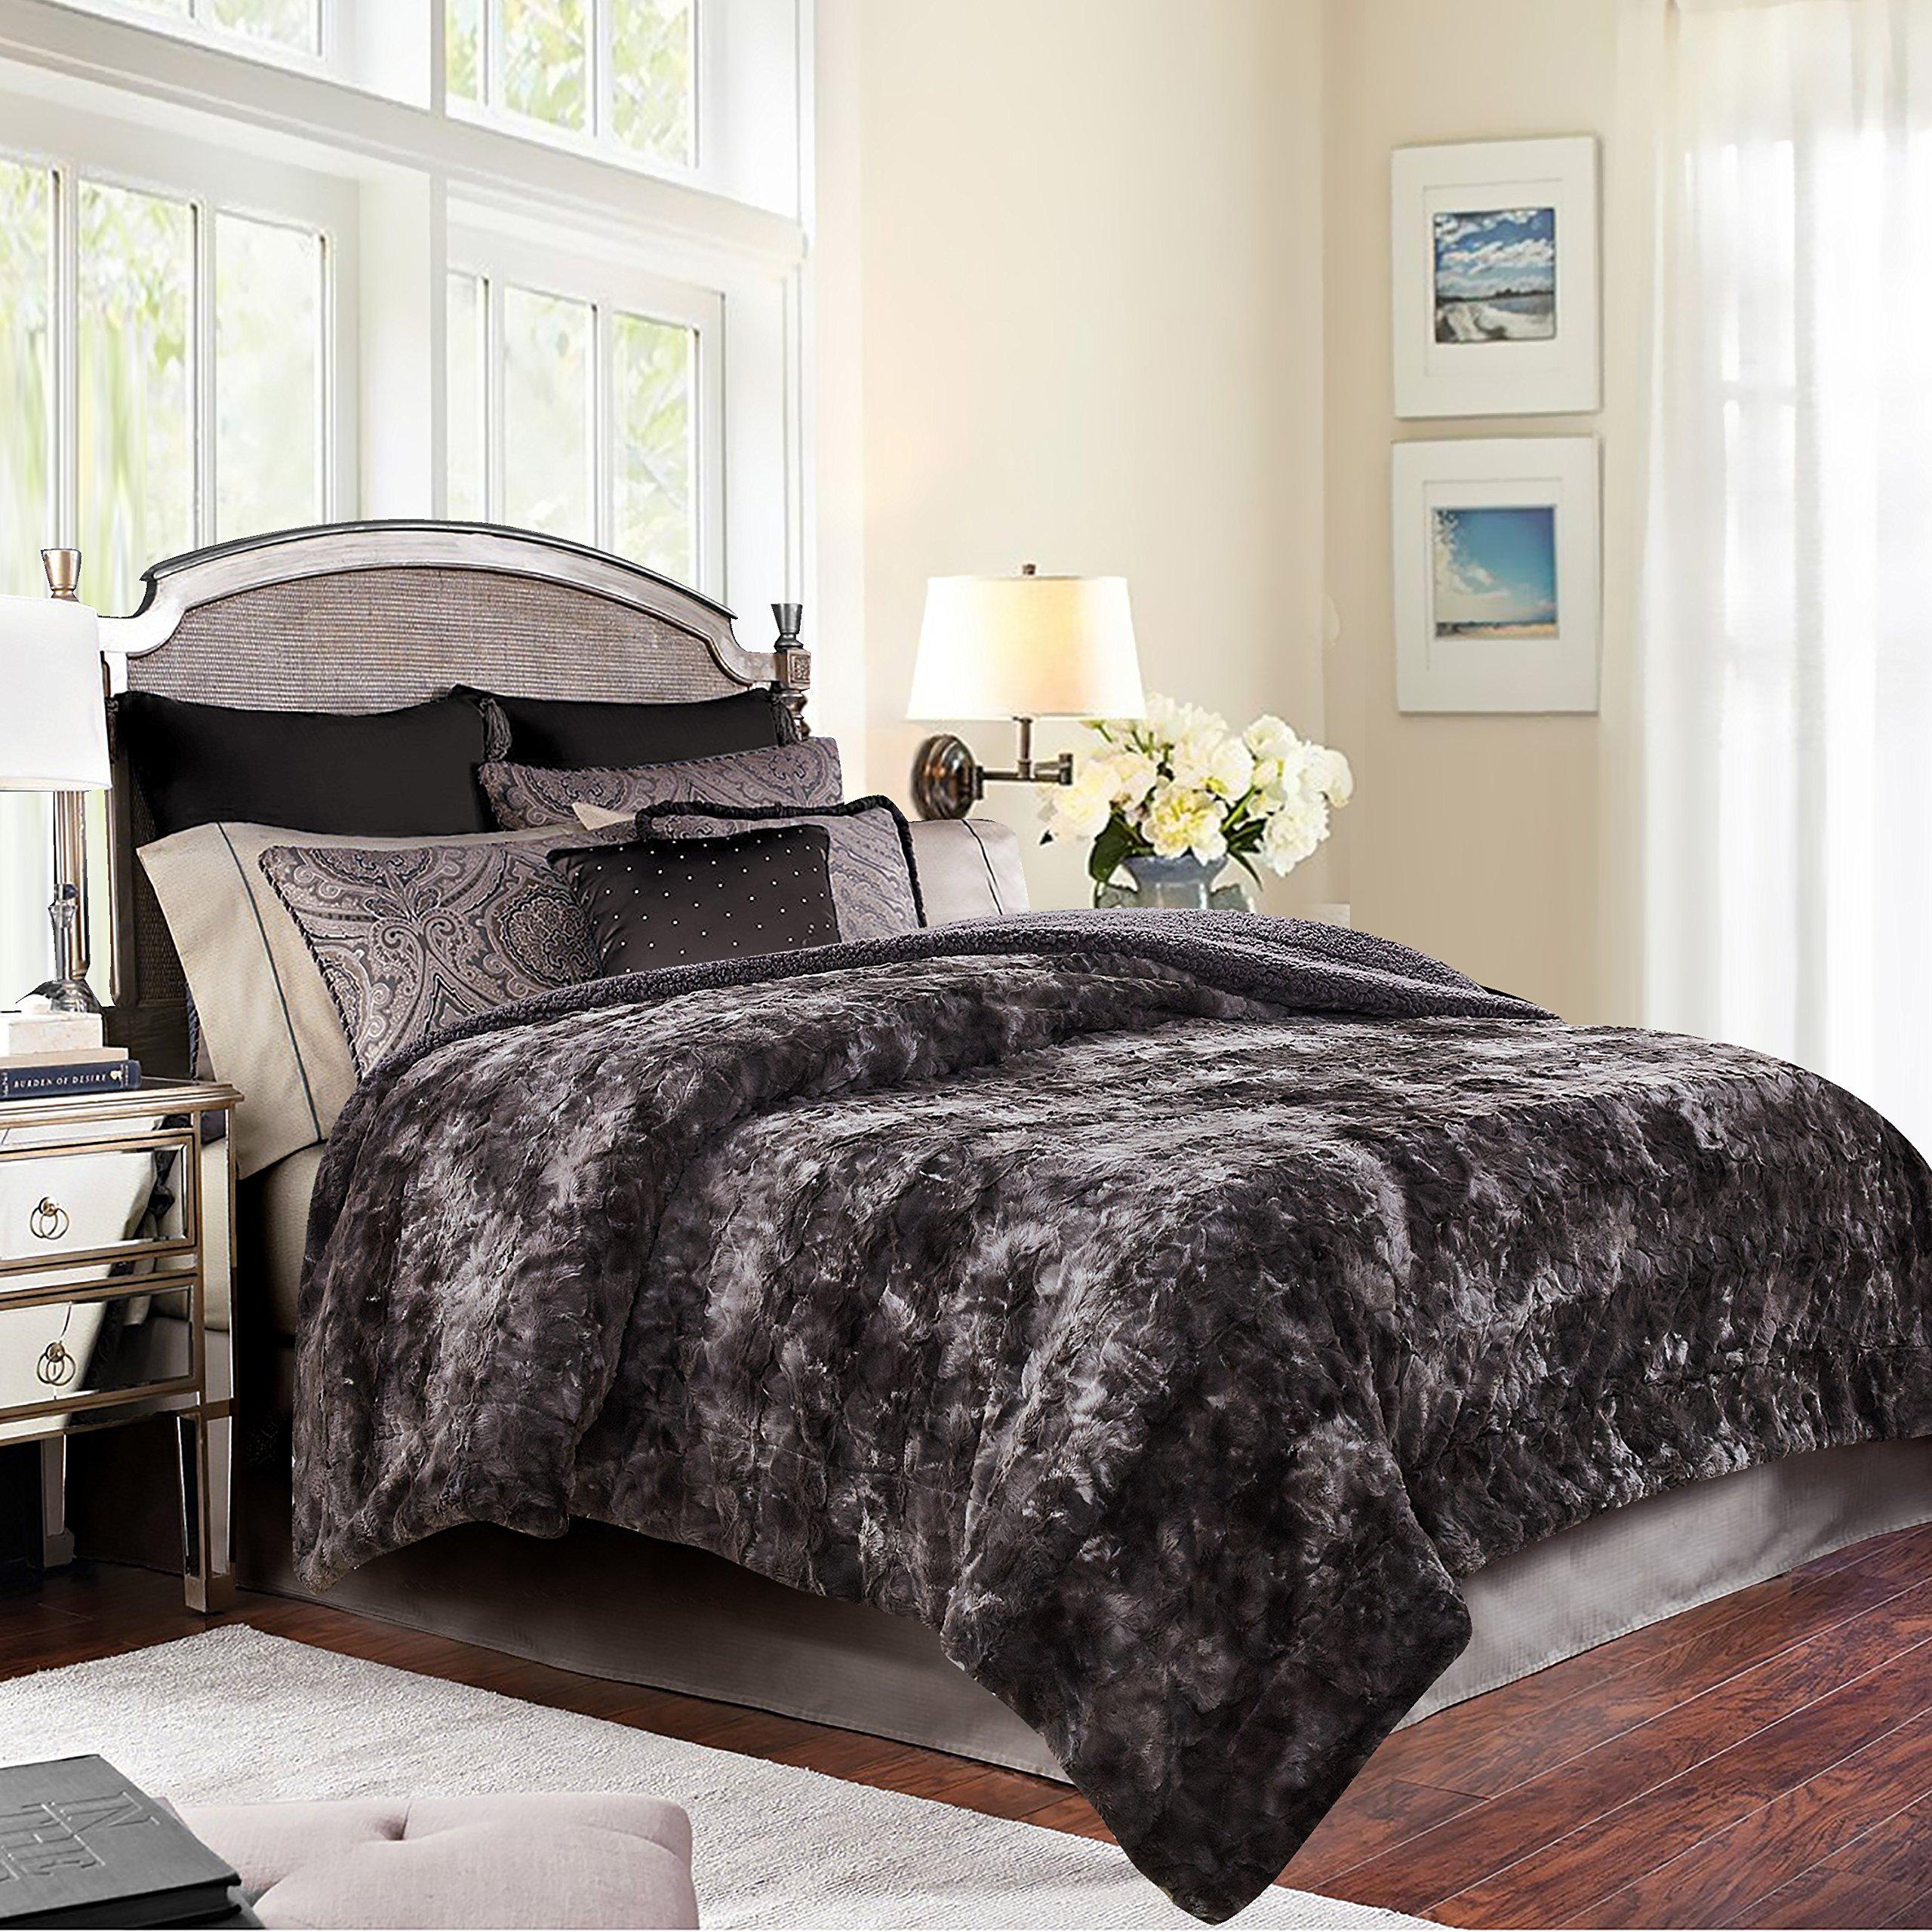 38 Small Yet Super Cozy Living Room Designs: Chanasya Faux Fur Bed Throw Blanket